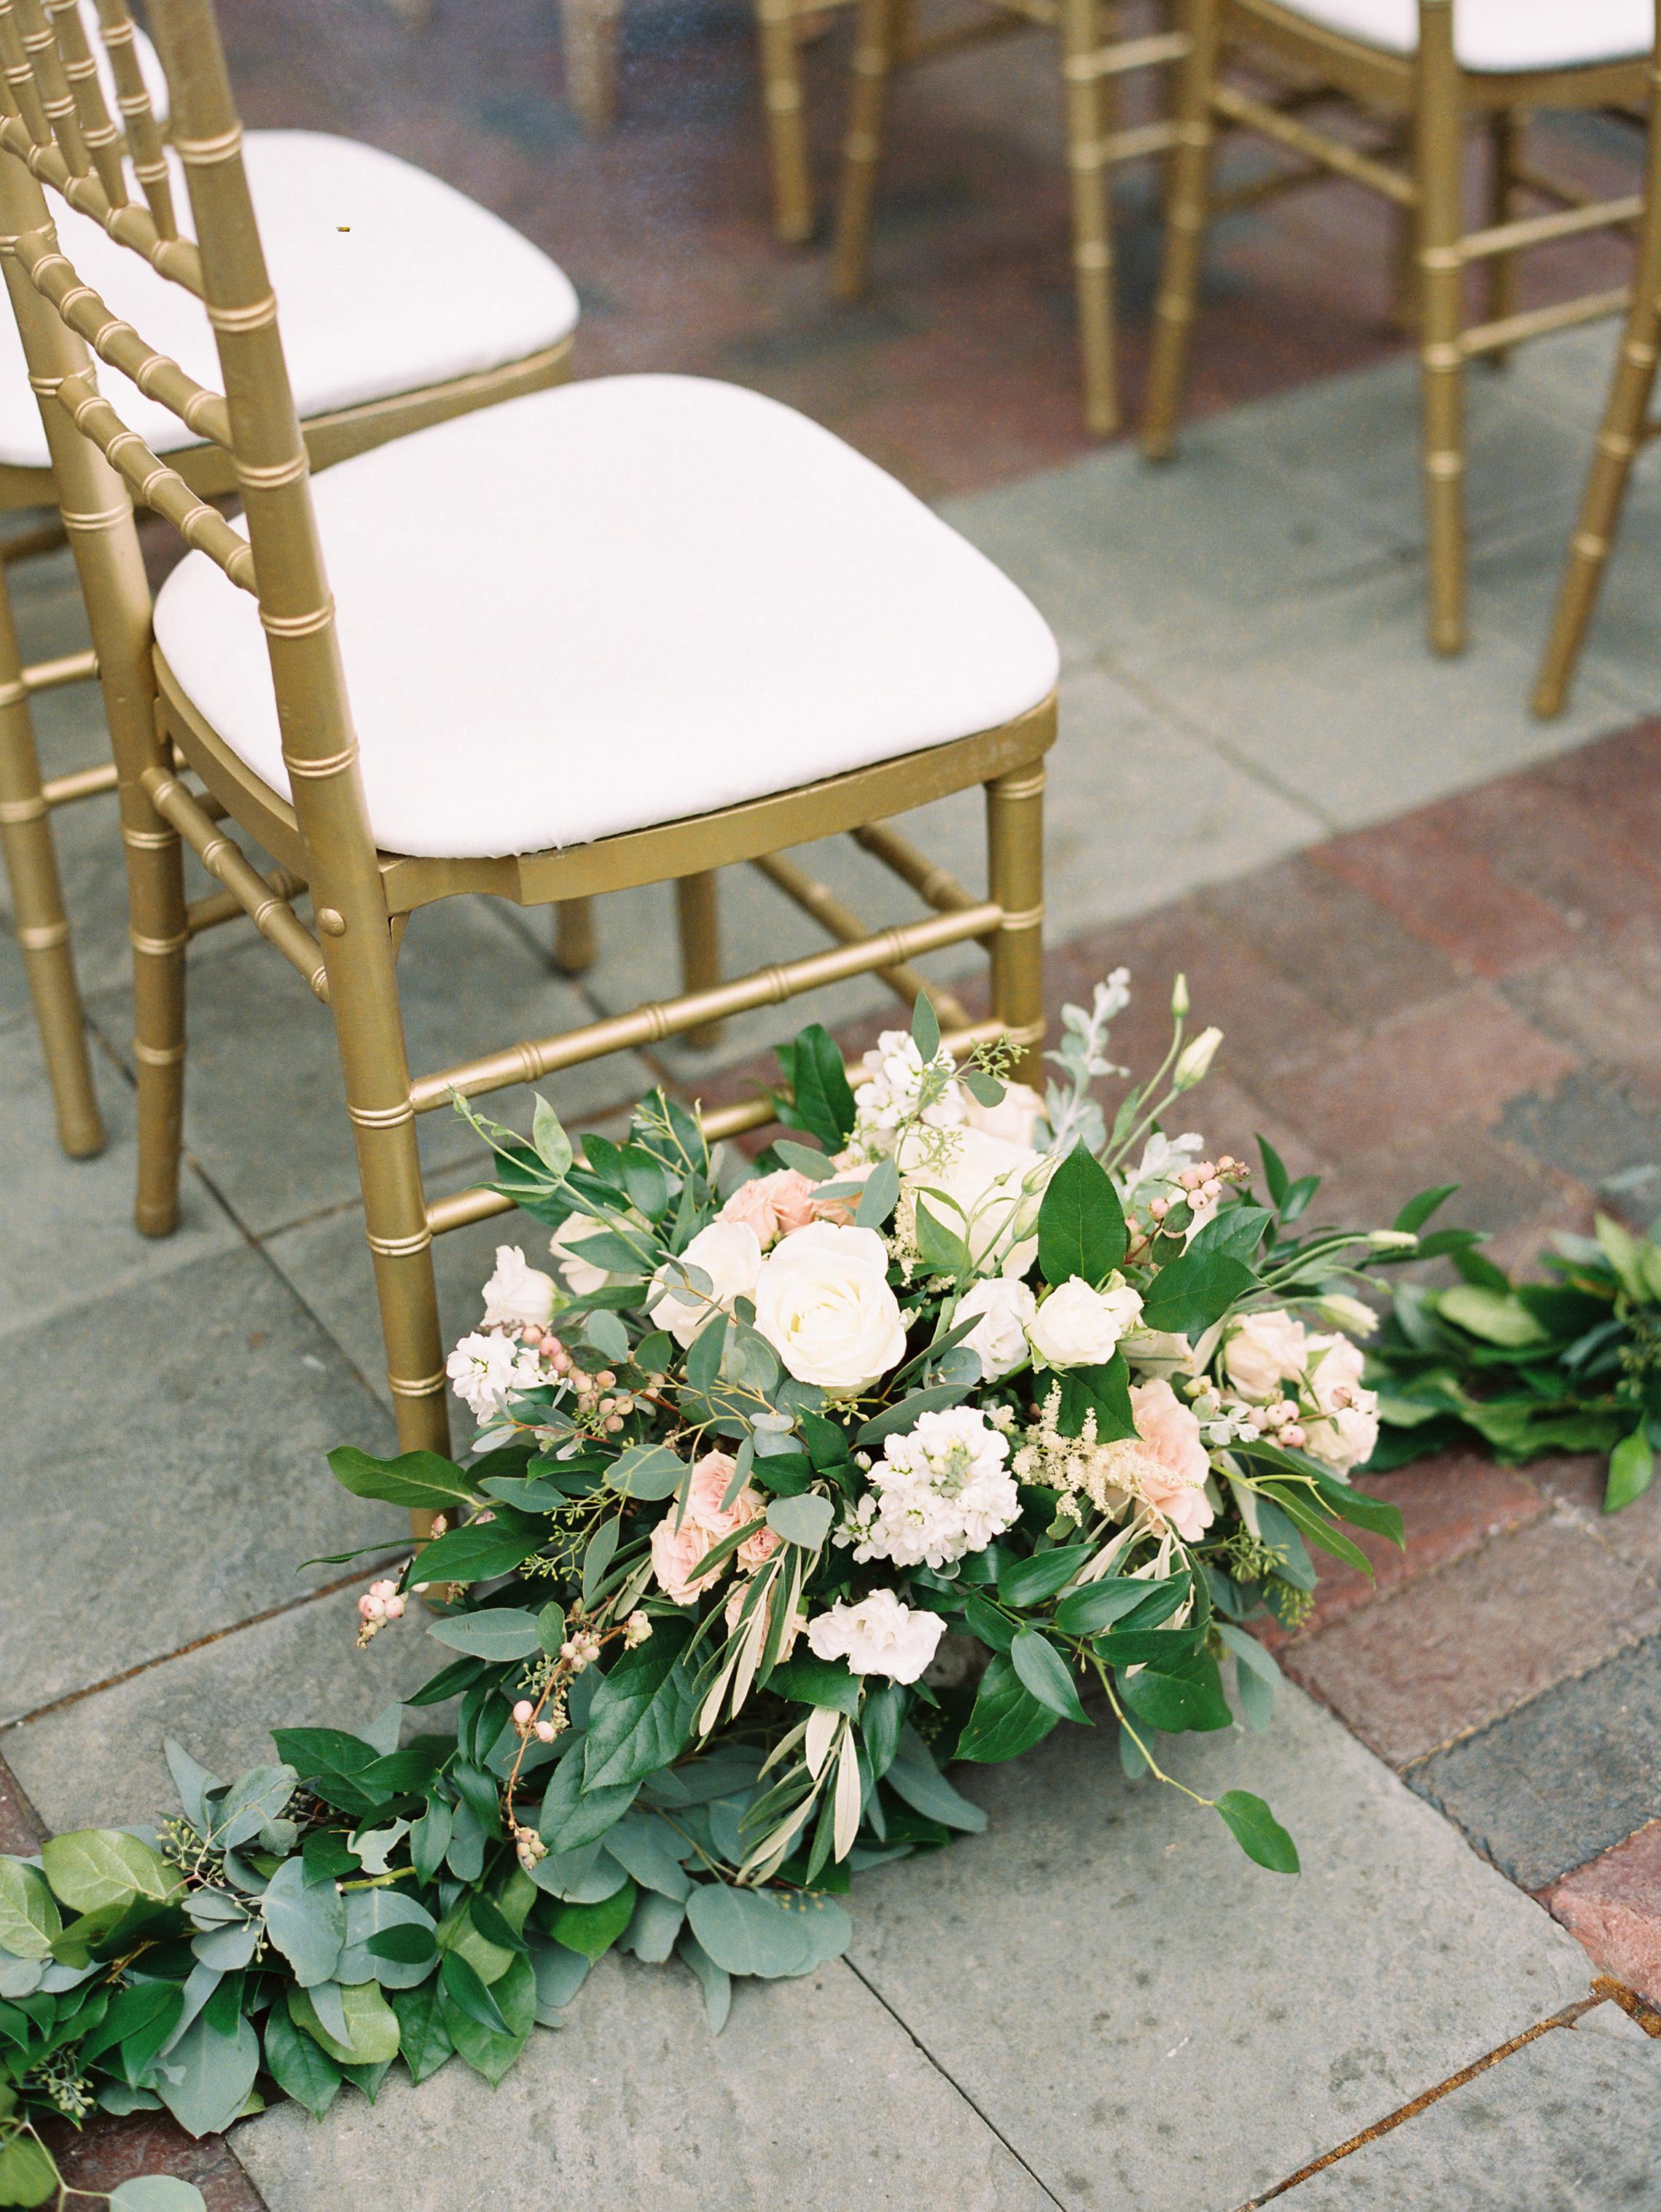 04_jukes_wedding-004.JPG